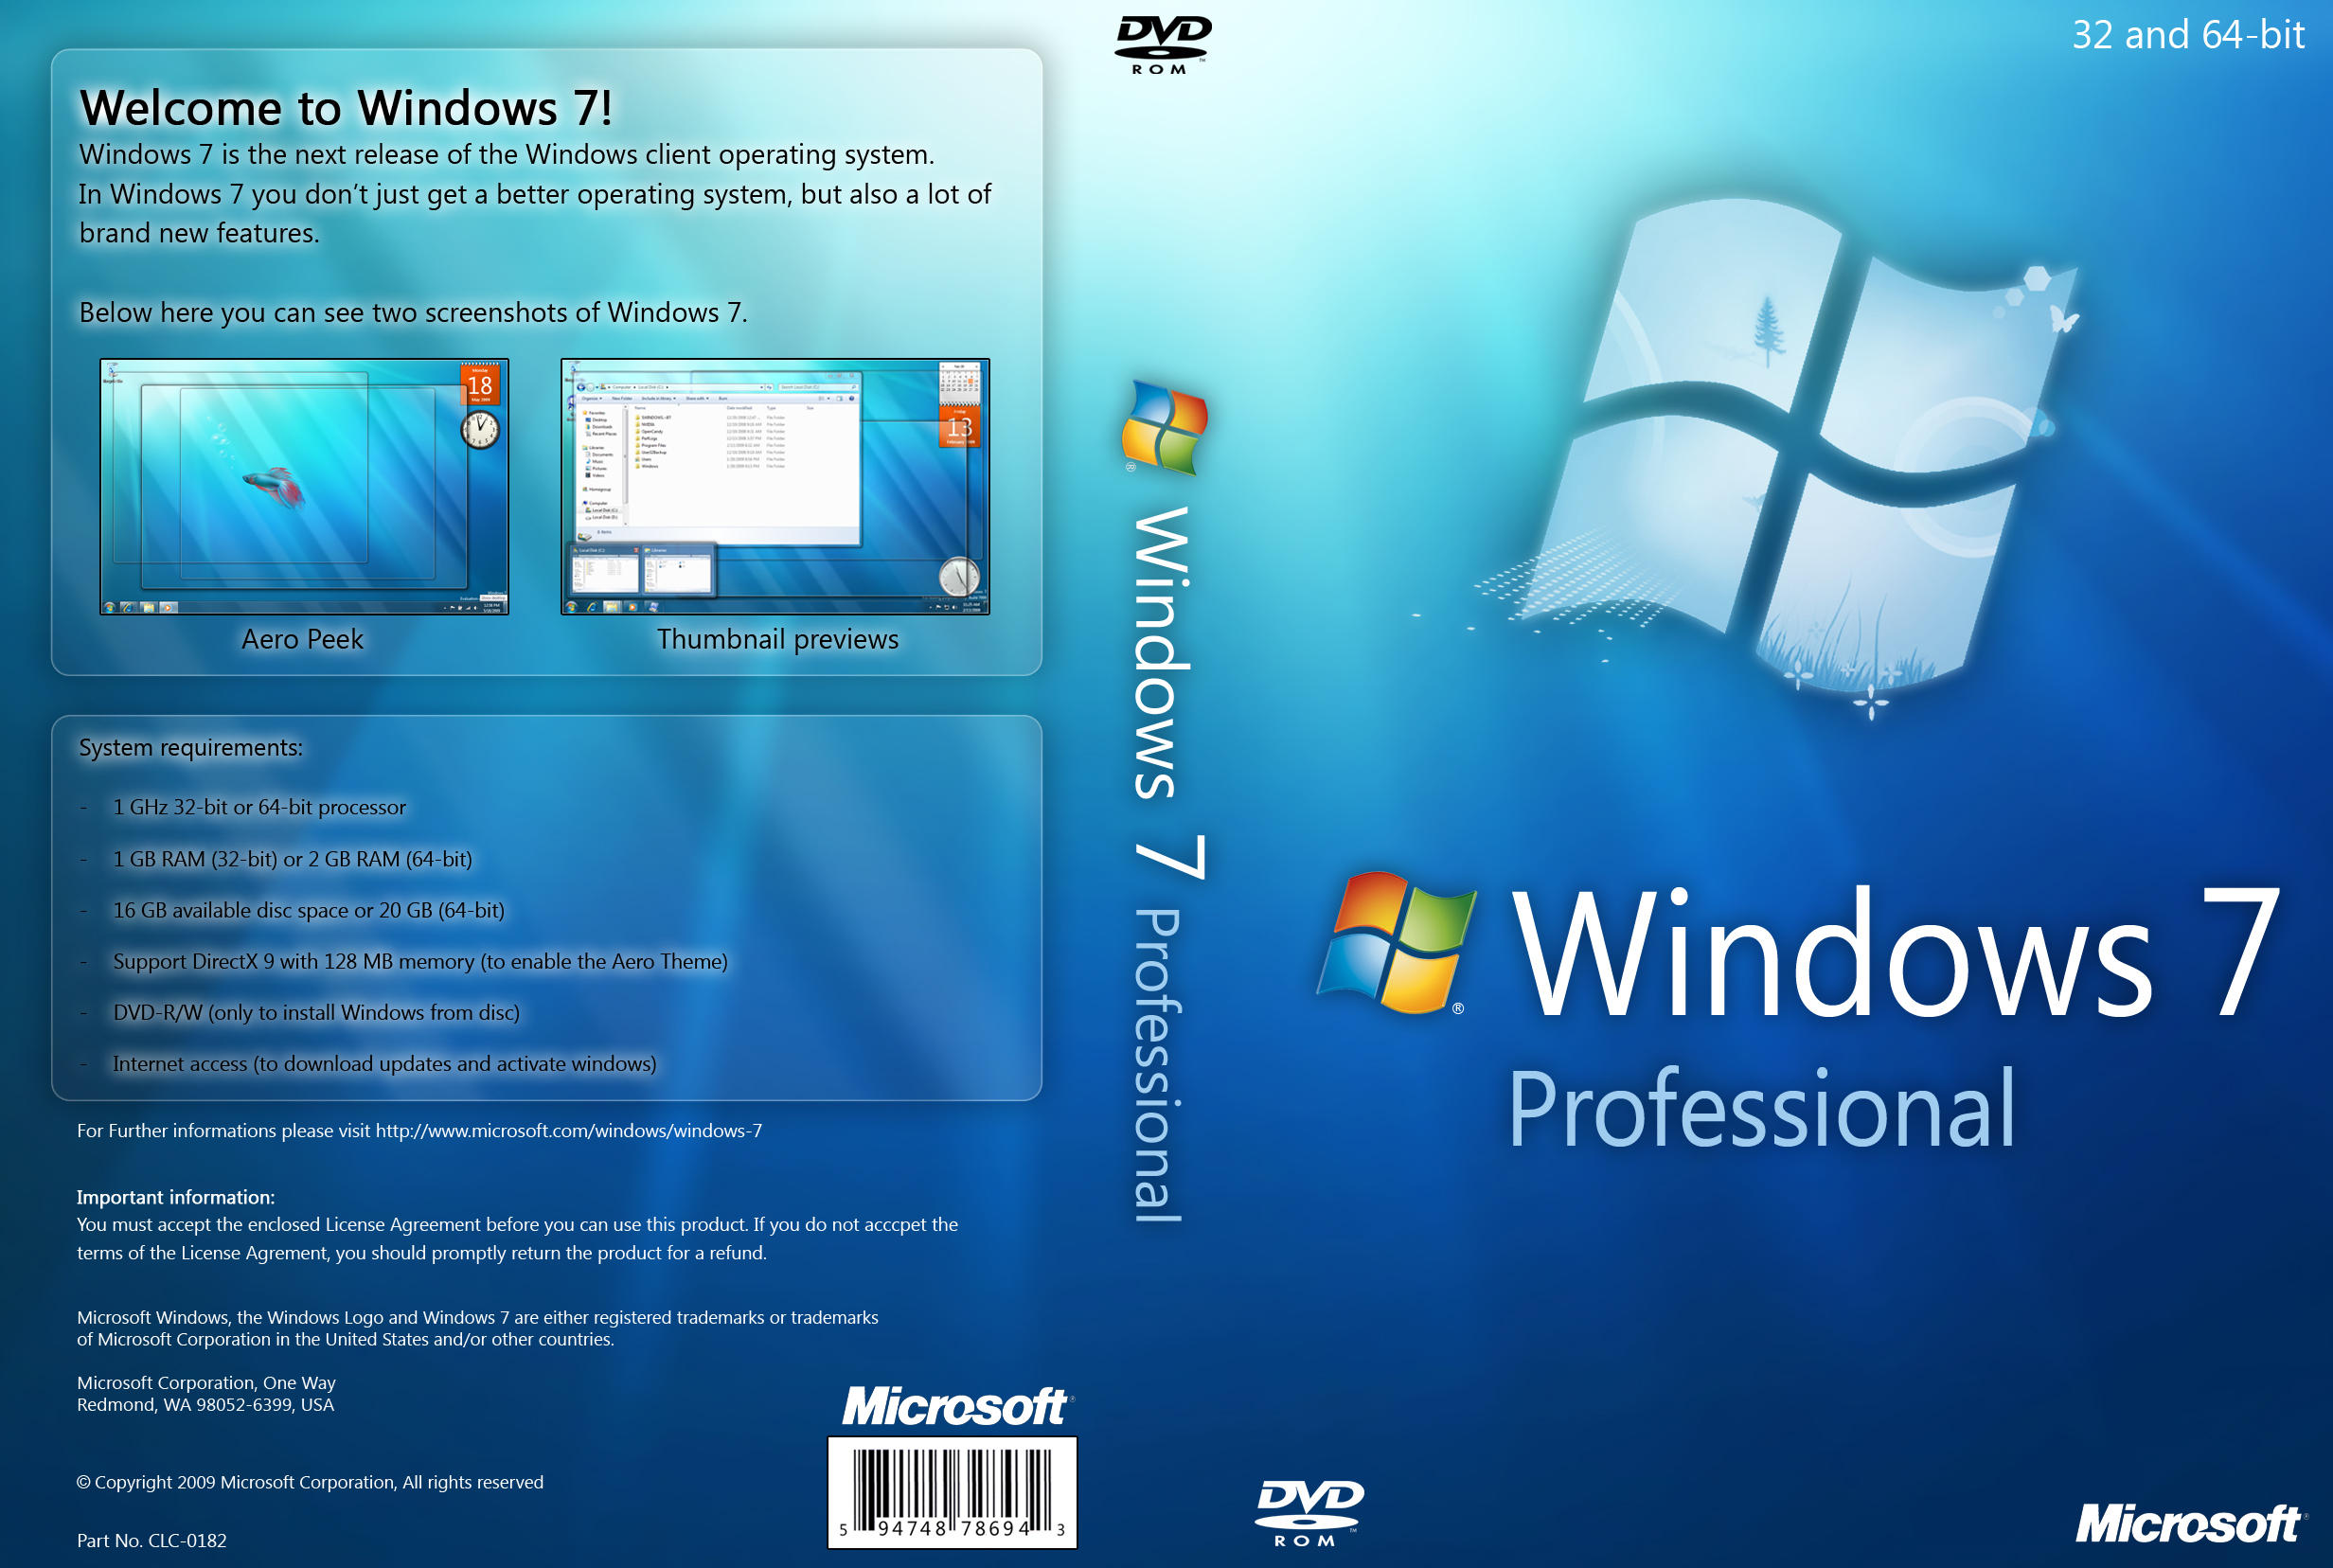 windows 7 professional dvd by yaxxe on deviantart